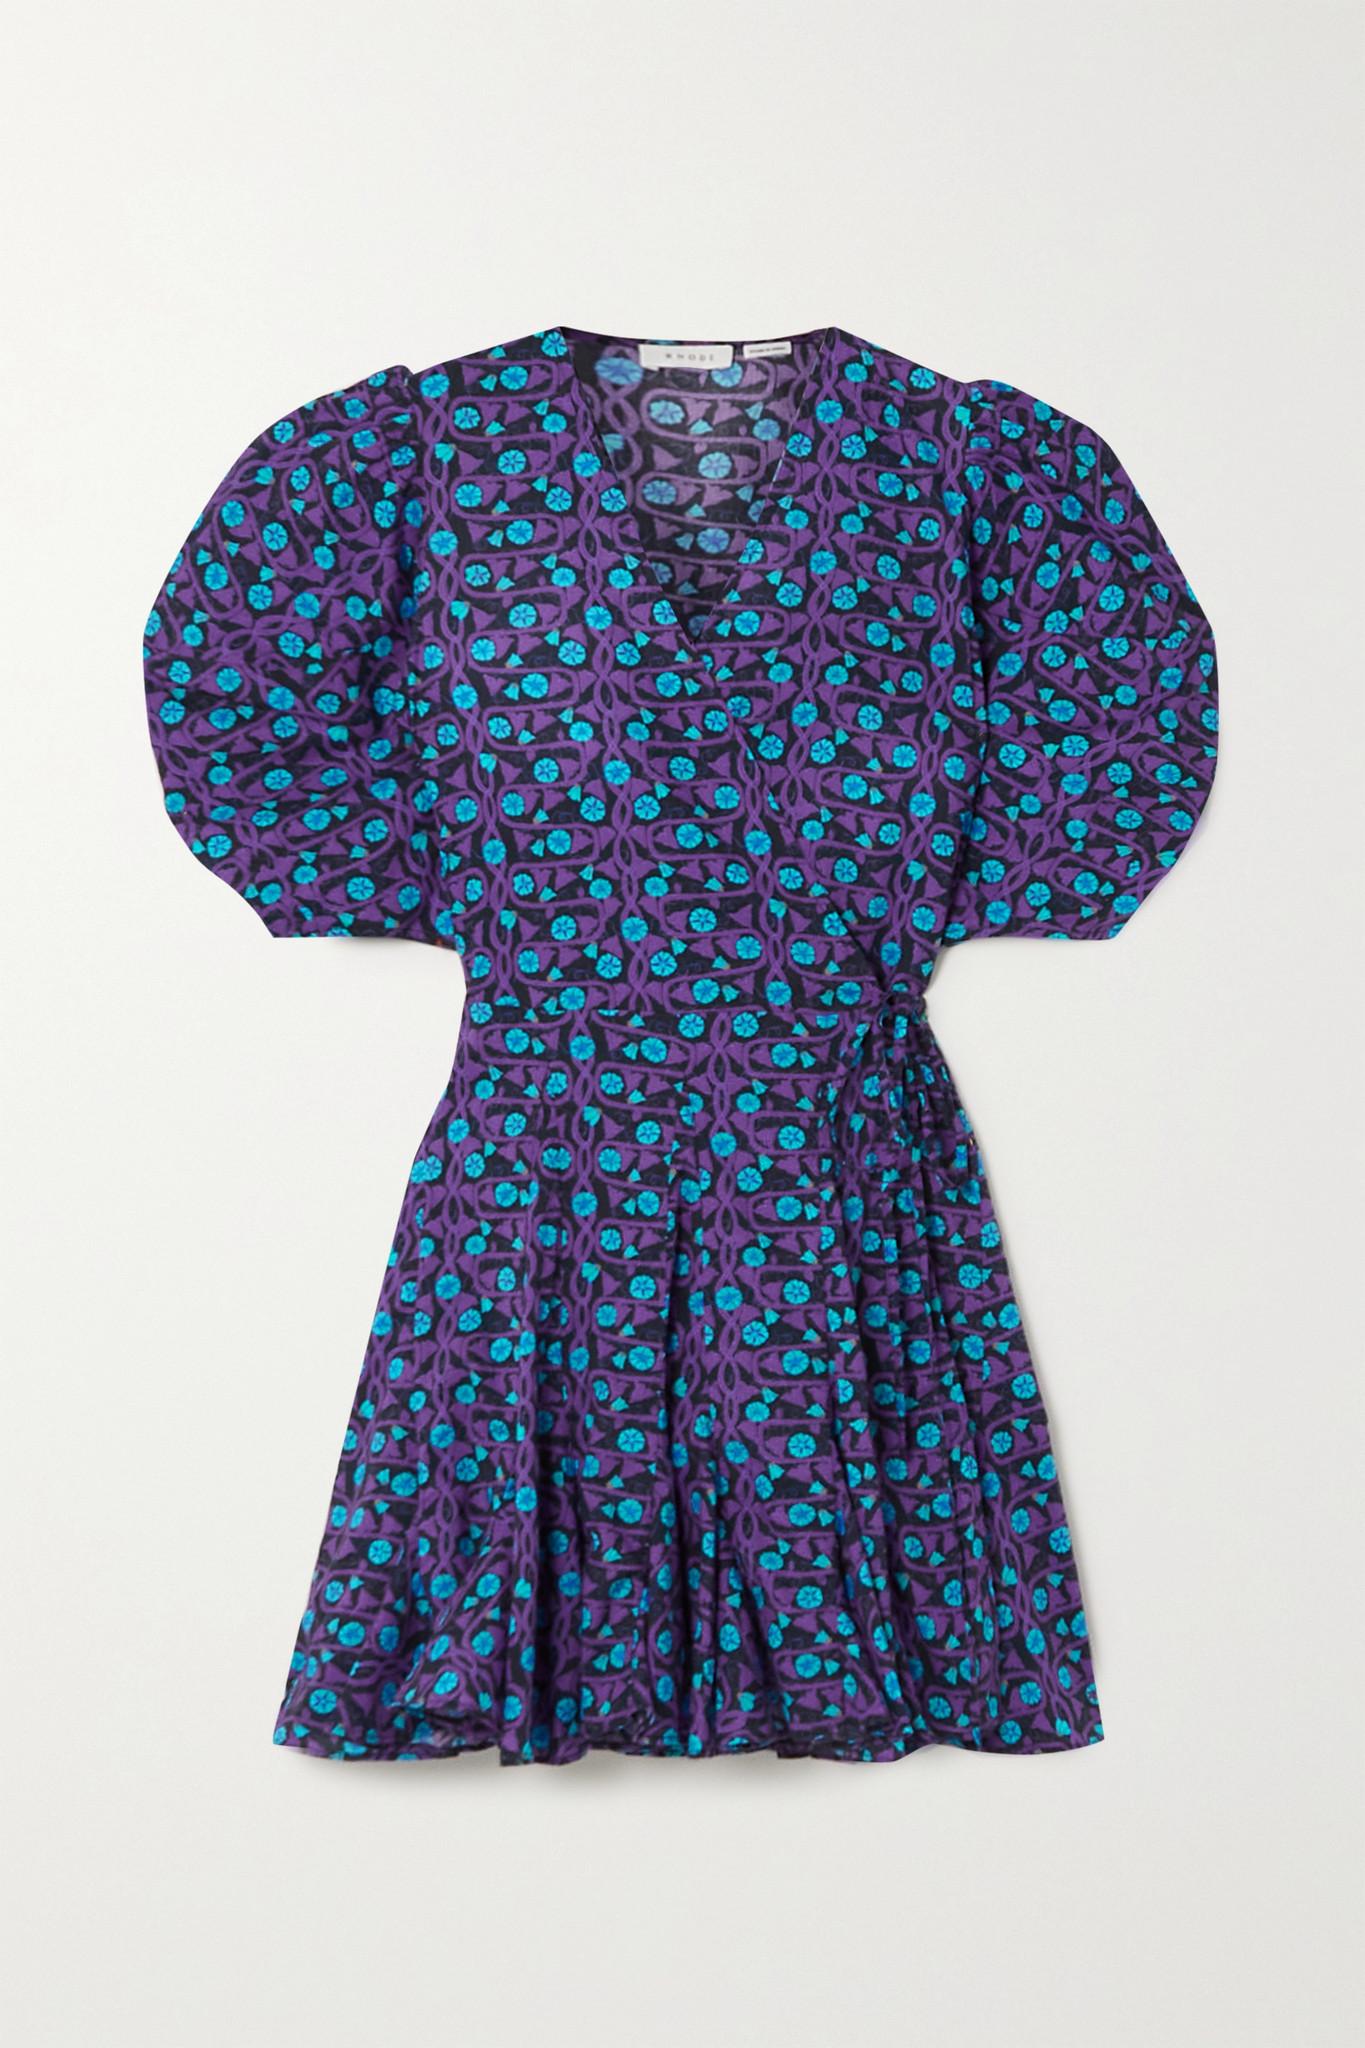 RHODE - Claudine Printed Cotton-voile Mini Wrap Dress - Purple - medium